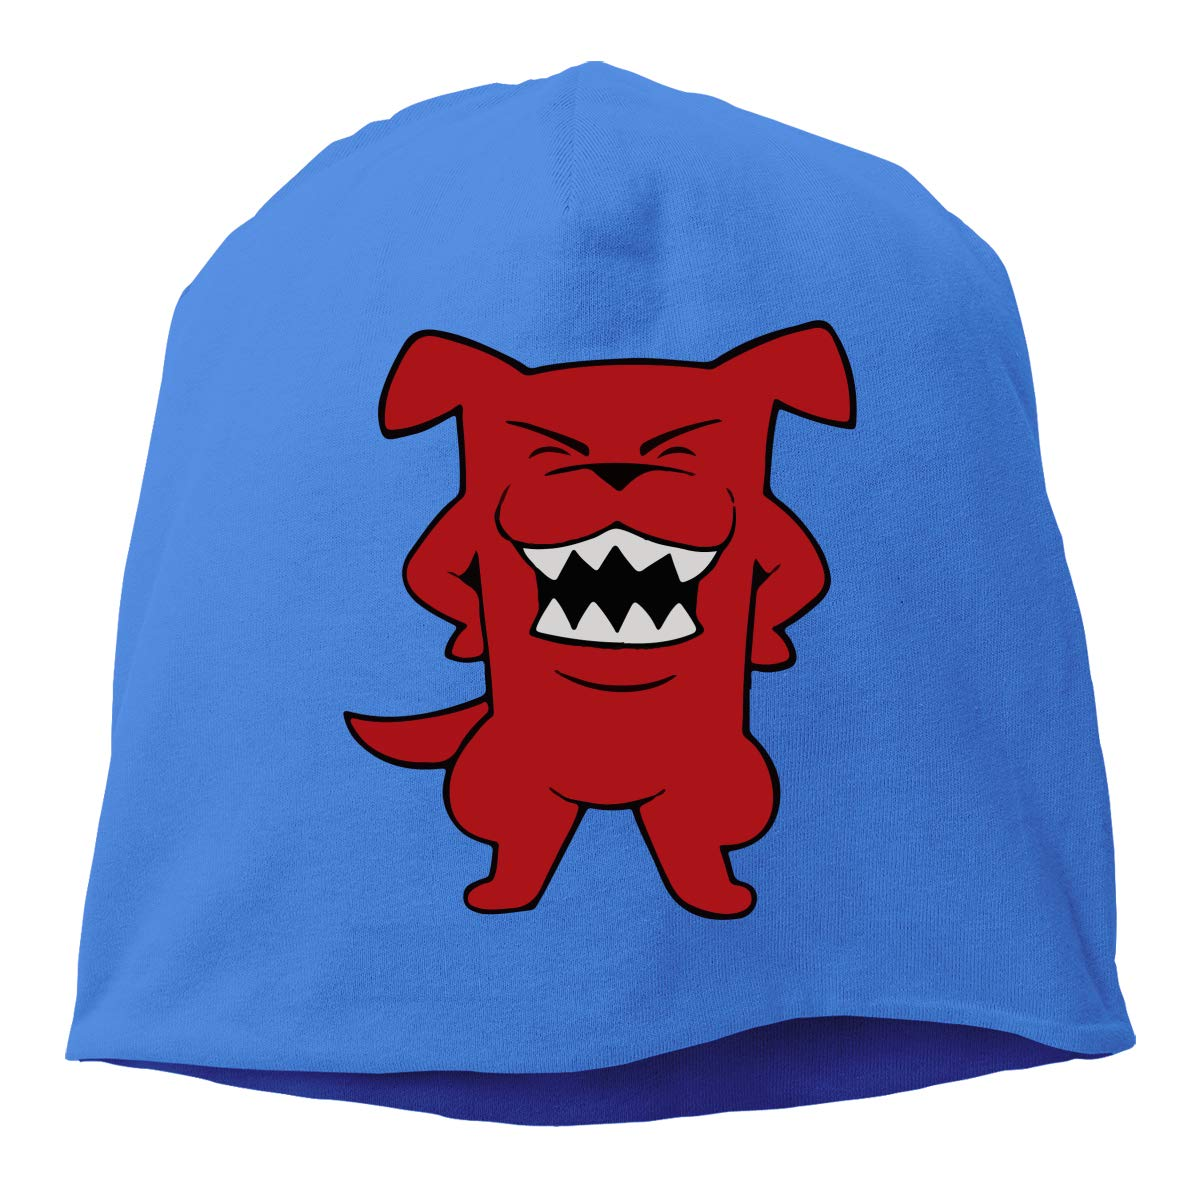 Winter Warm Knit Hat TLPM9LKMBM Wild Dog Beanie Skull Cap for Women and Men